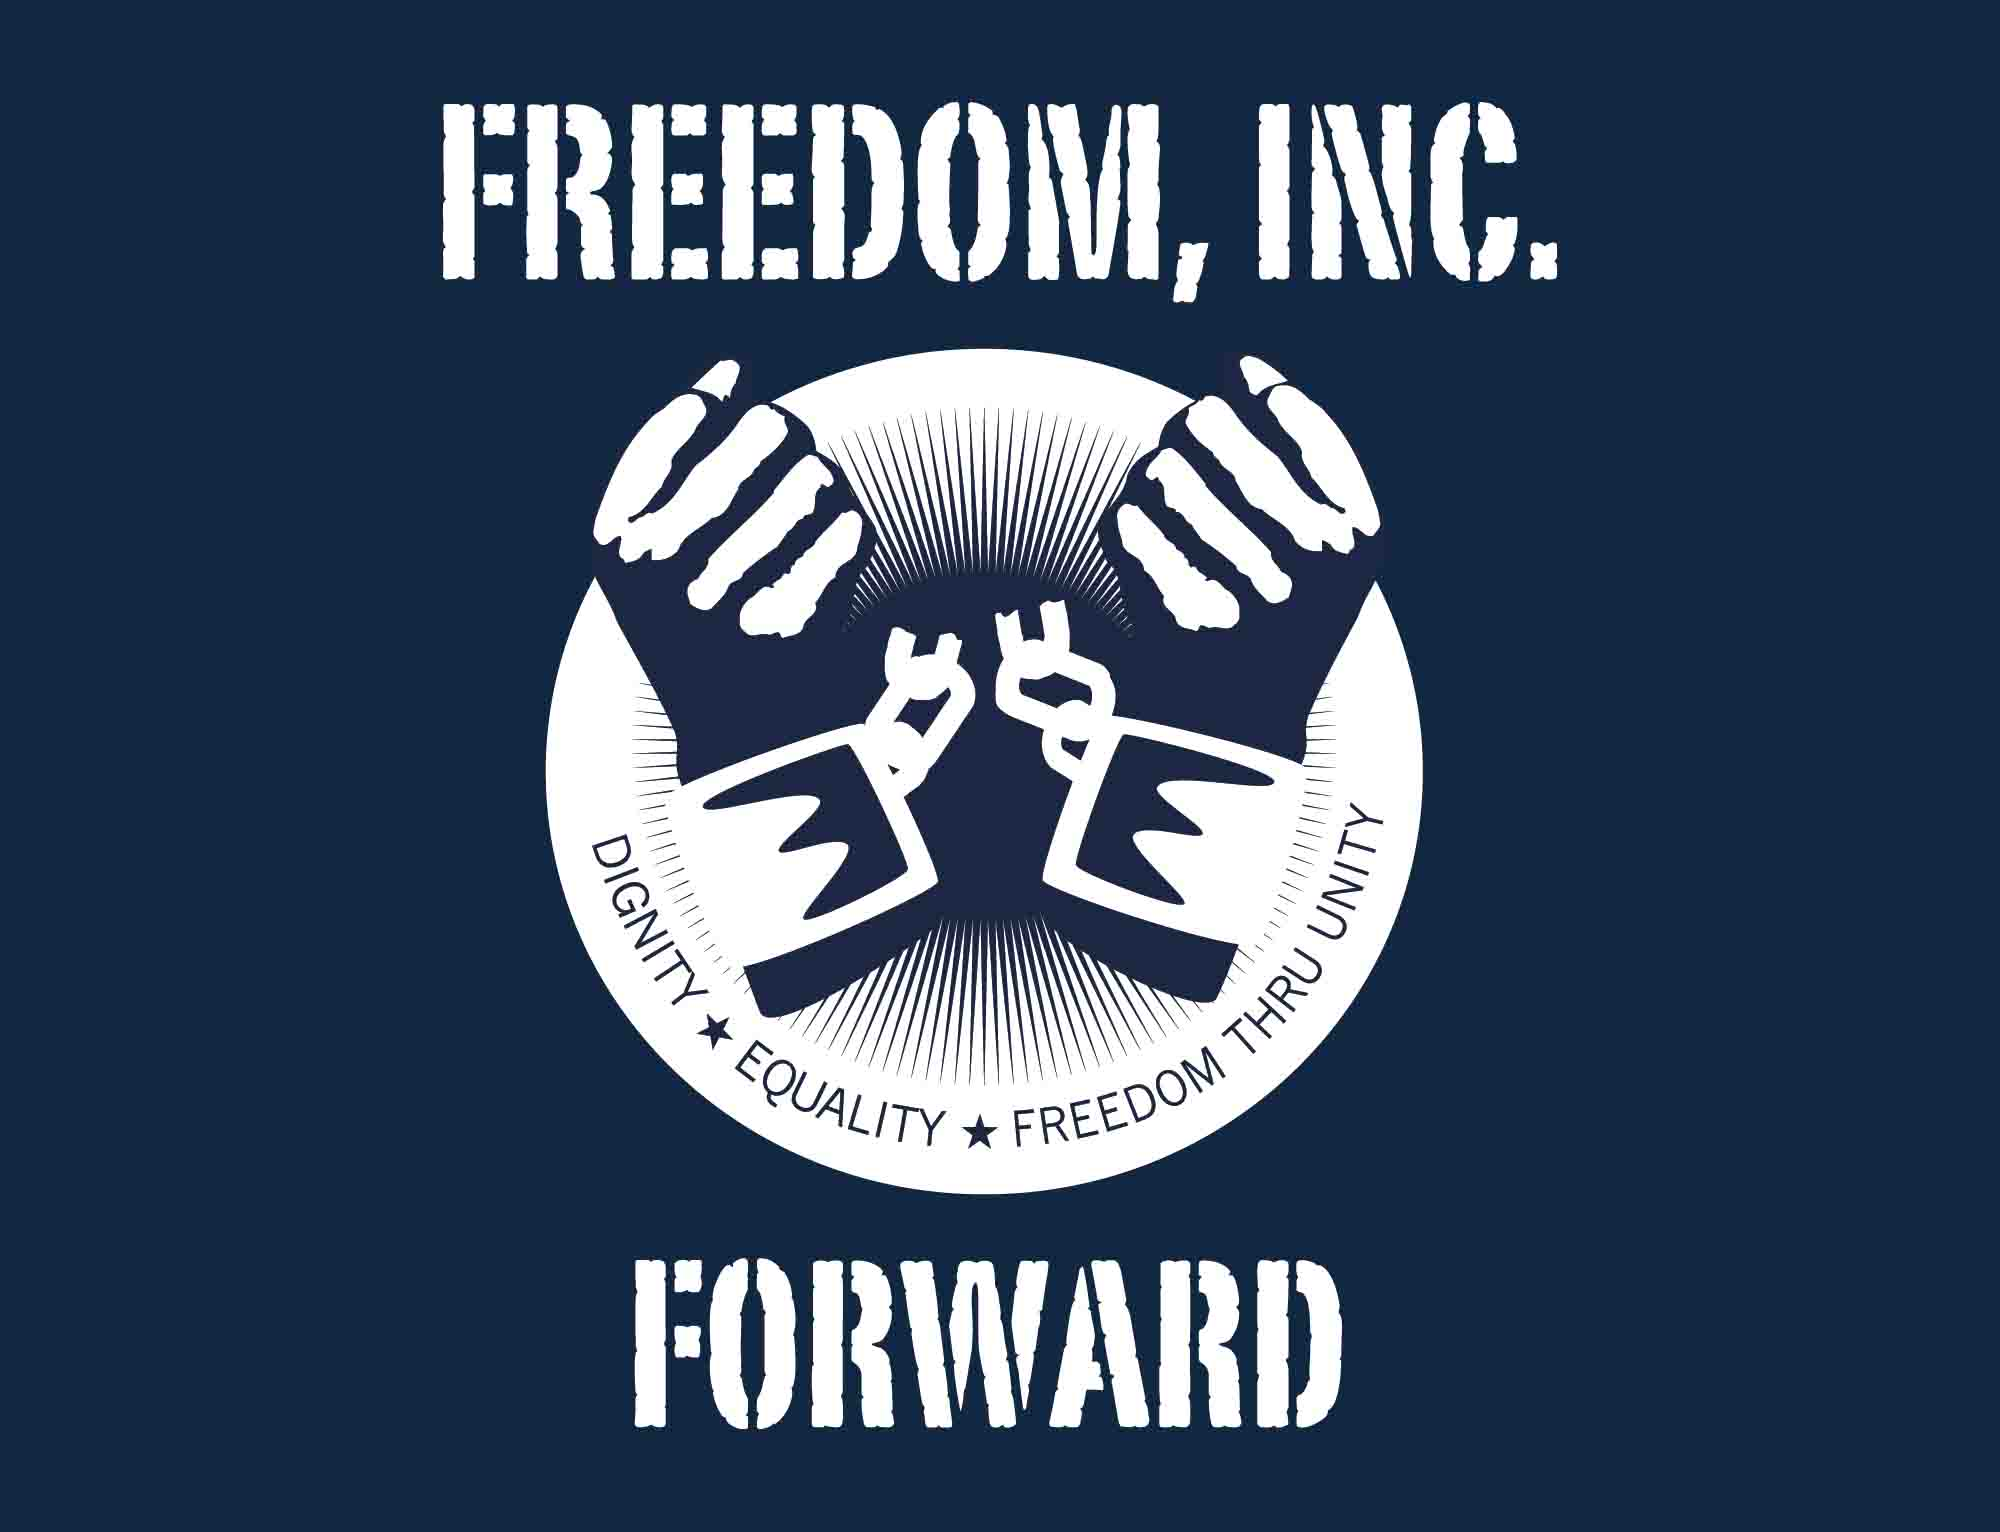 Freedom, INC